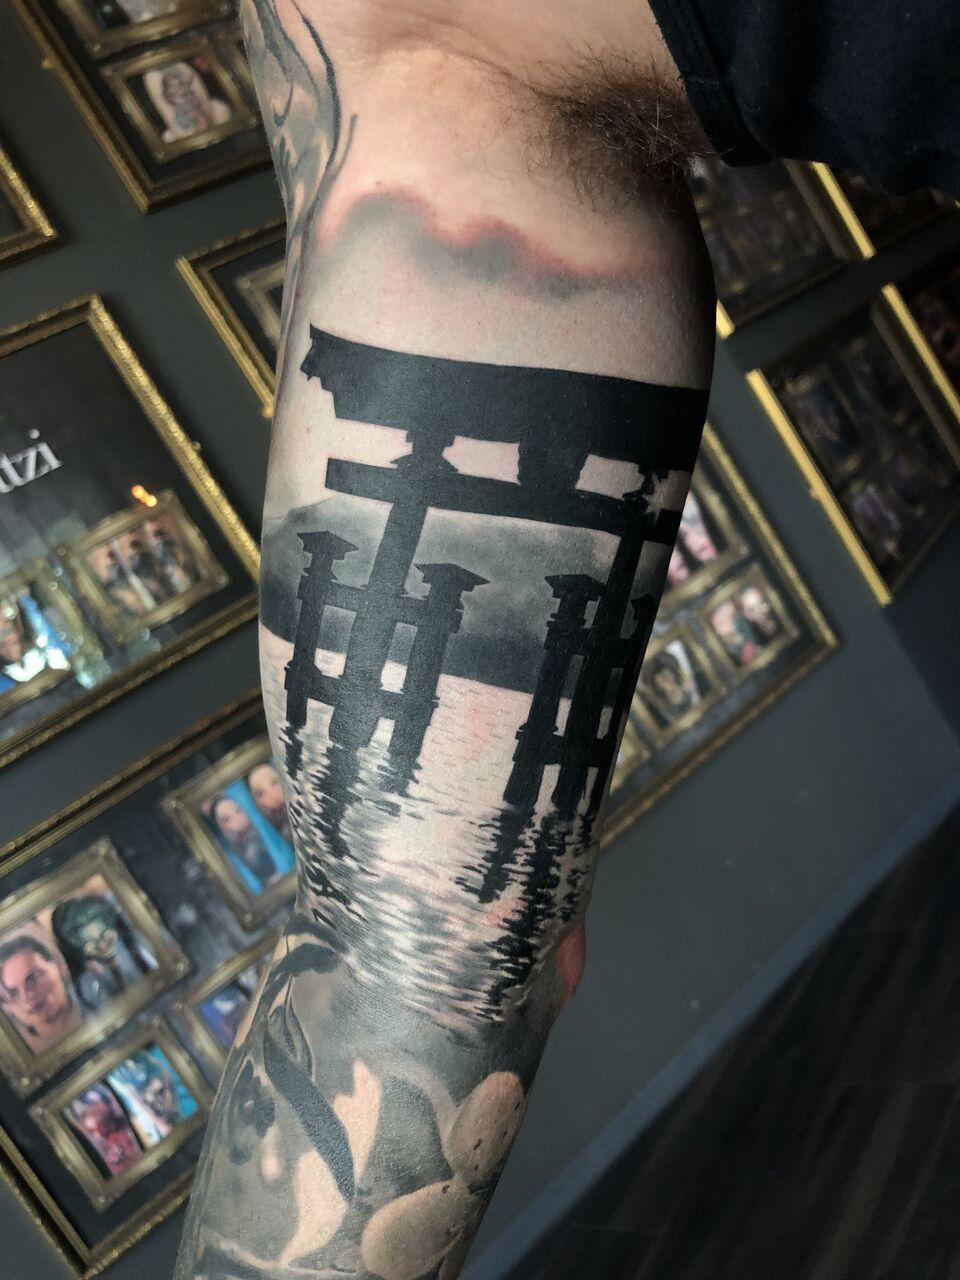 Japanese Shinto Gate tattoo by Laci.  Limited availability at Redemption Tattoo ... -  Japanese Shinto Gate tattoo by Laci.  Limited availability at Redemption Tattoo Studio.  - #availability #Gate #Japanese #JapaneseTattoos #Laci #Limited #OpticalIllusions #Redemption #Shinto #Tattoo